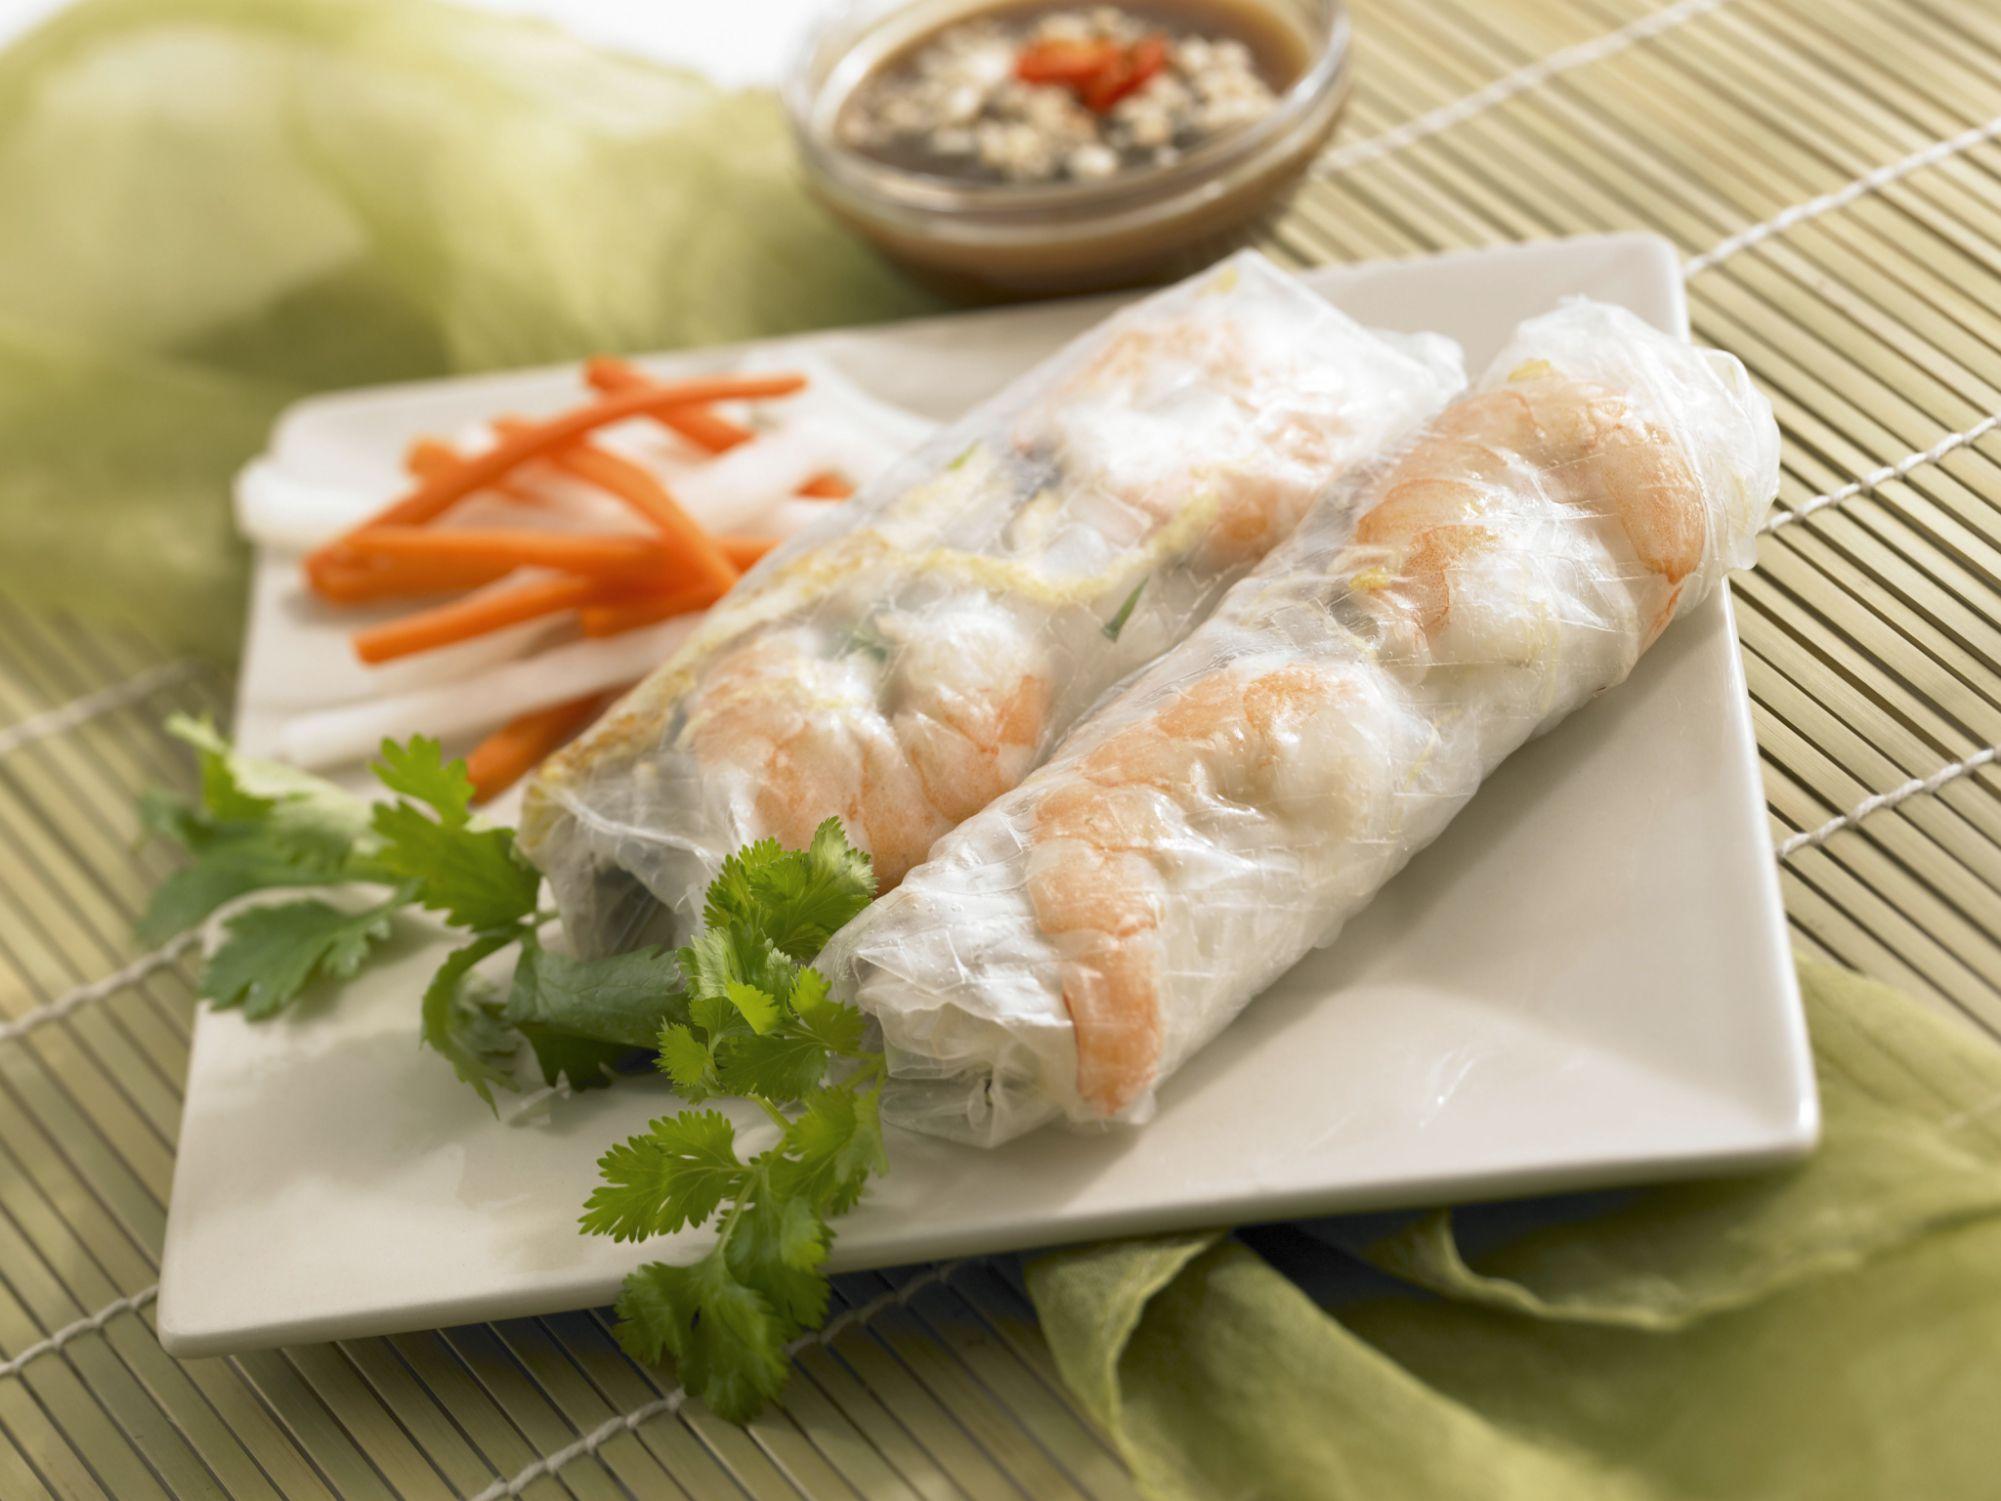 Healthy Vietnamese Food That's Lower in Calories